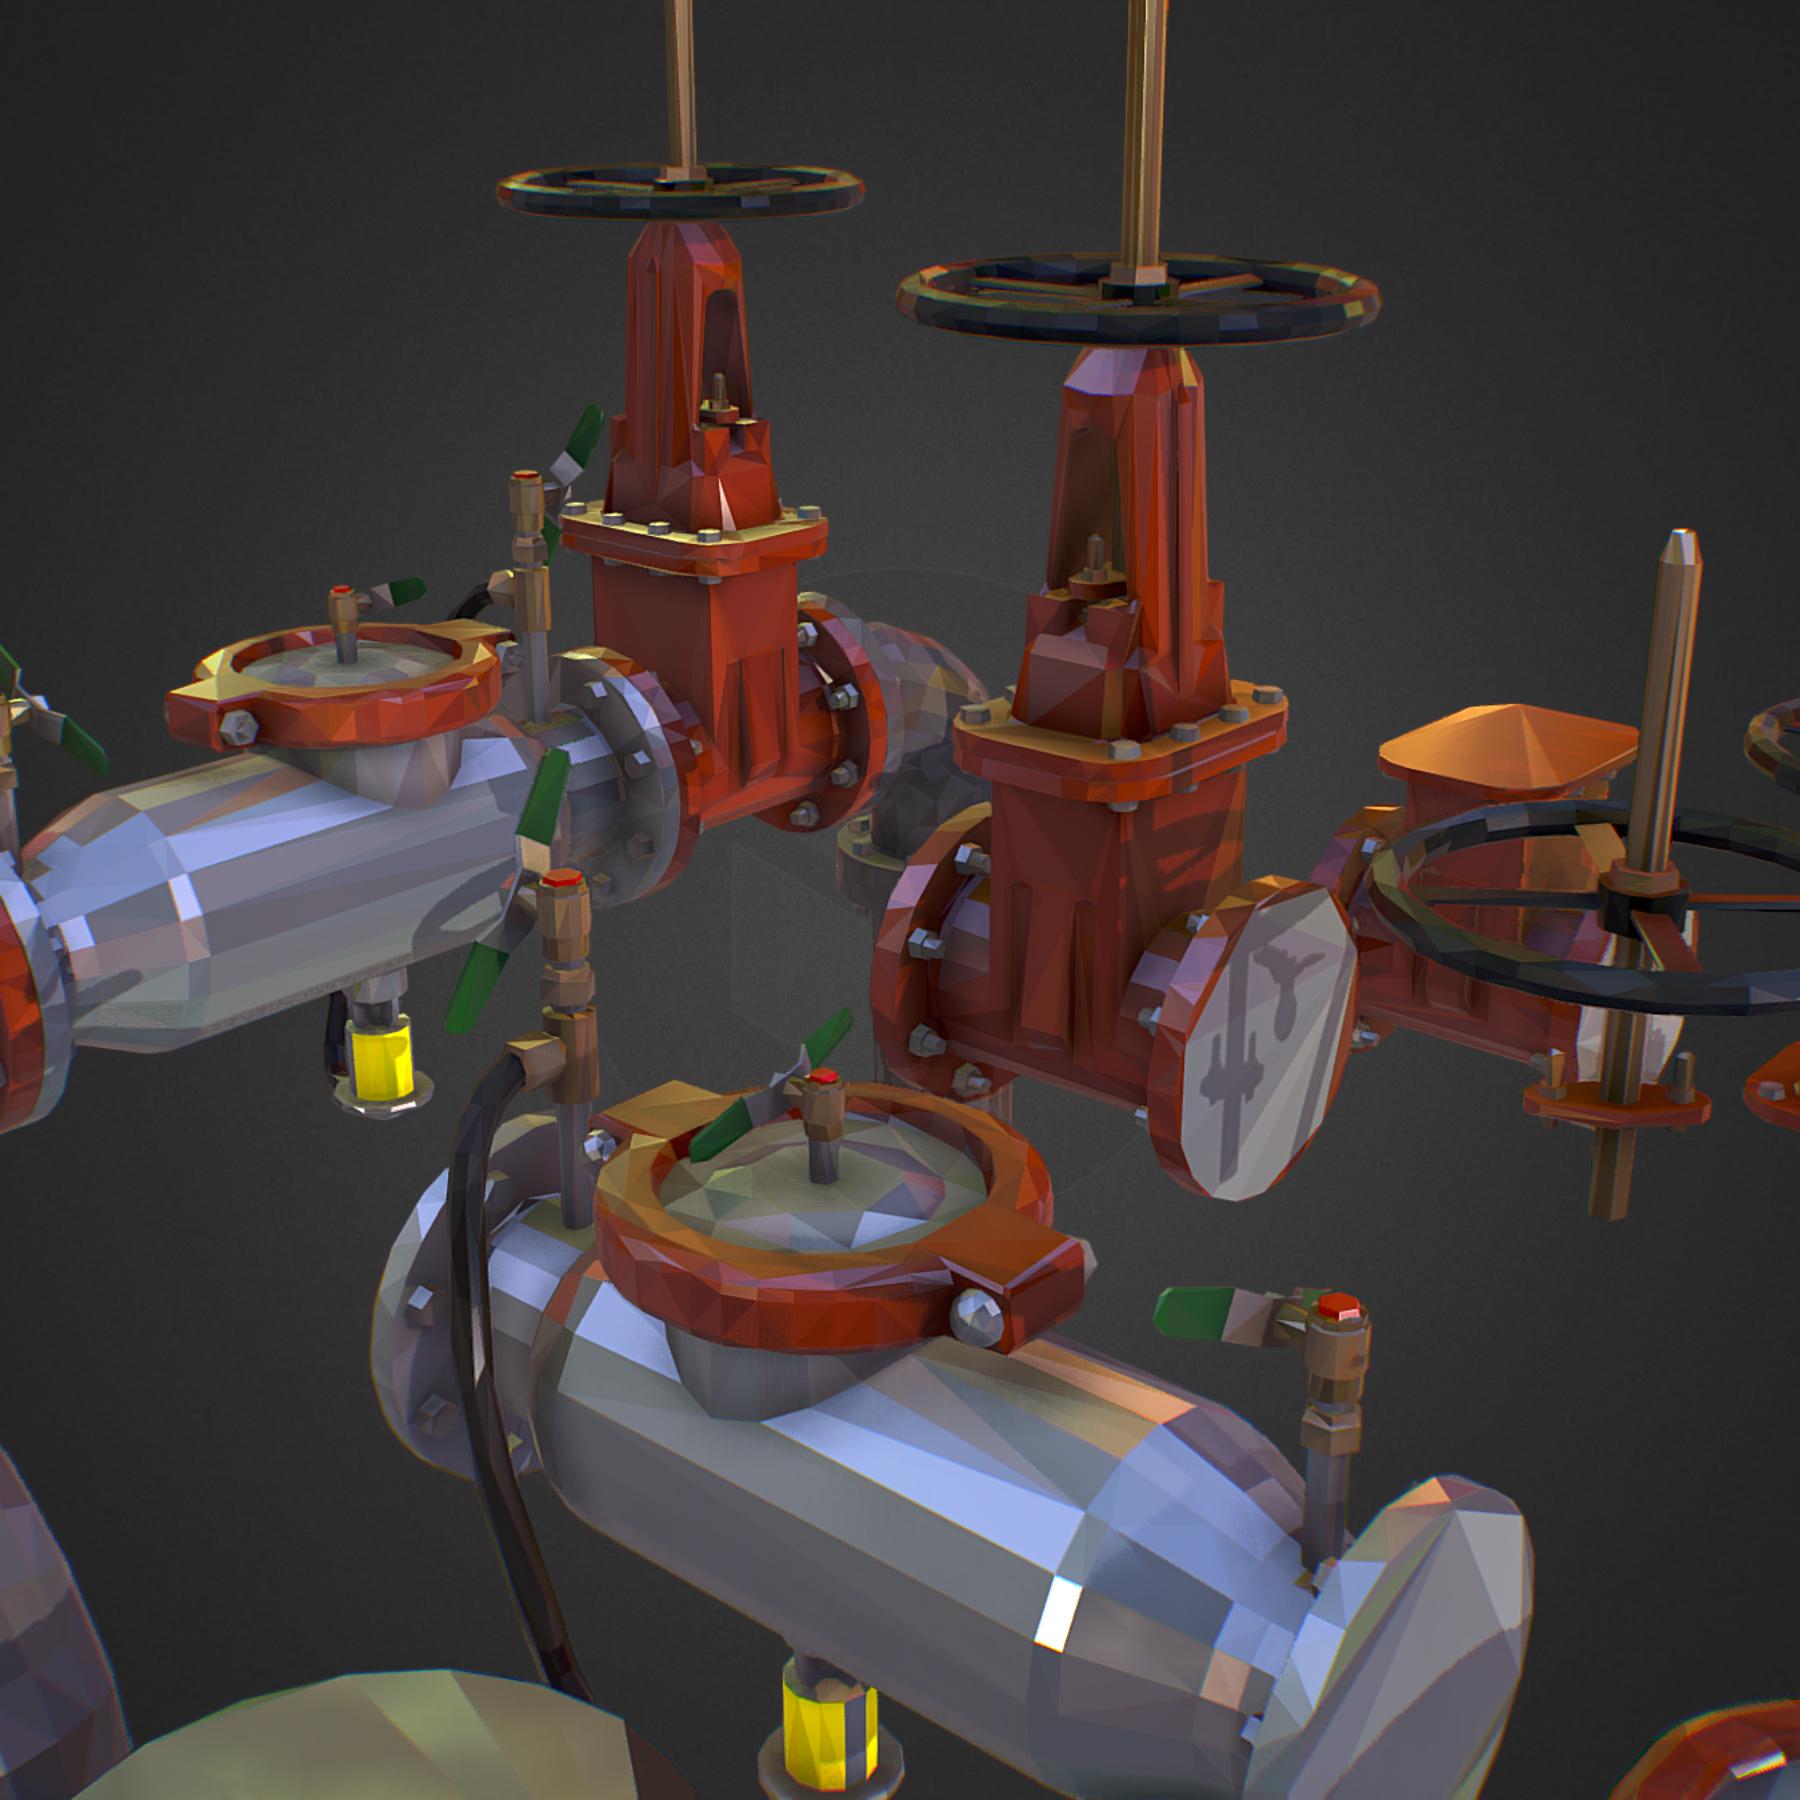 Low Poly ART Backflow Water Pipe Constructor 3d model max 3ds max plugin fbx ma mb tga targa icb vda vst pix obj 272558